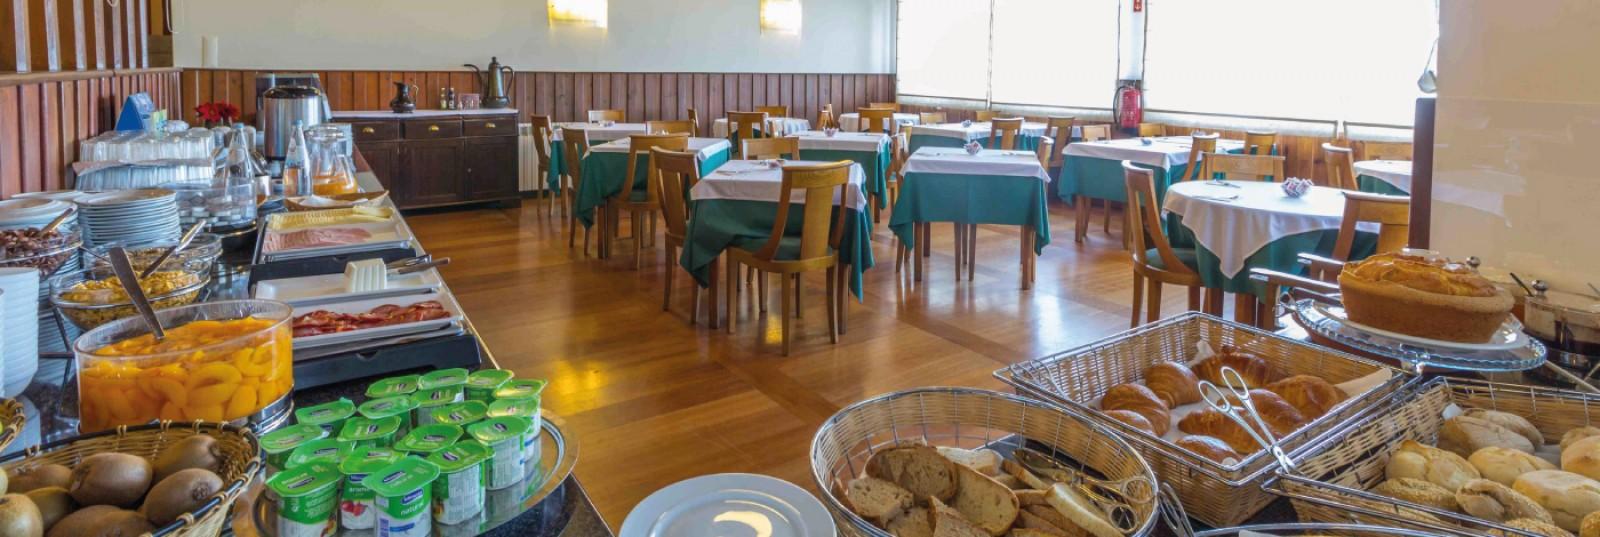 Hotel Eurosol Seia Camelo - desayuno